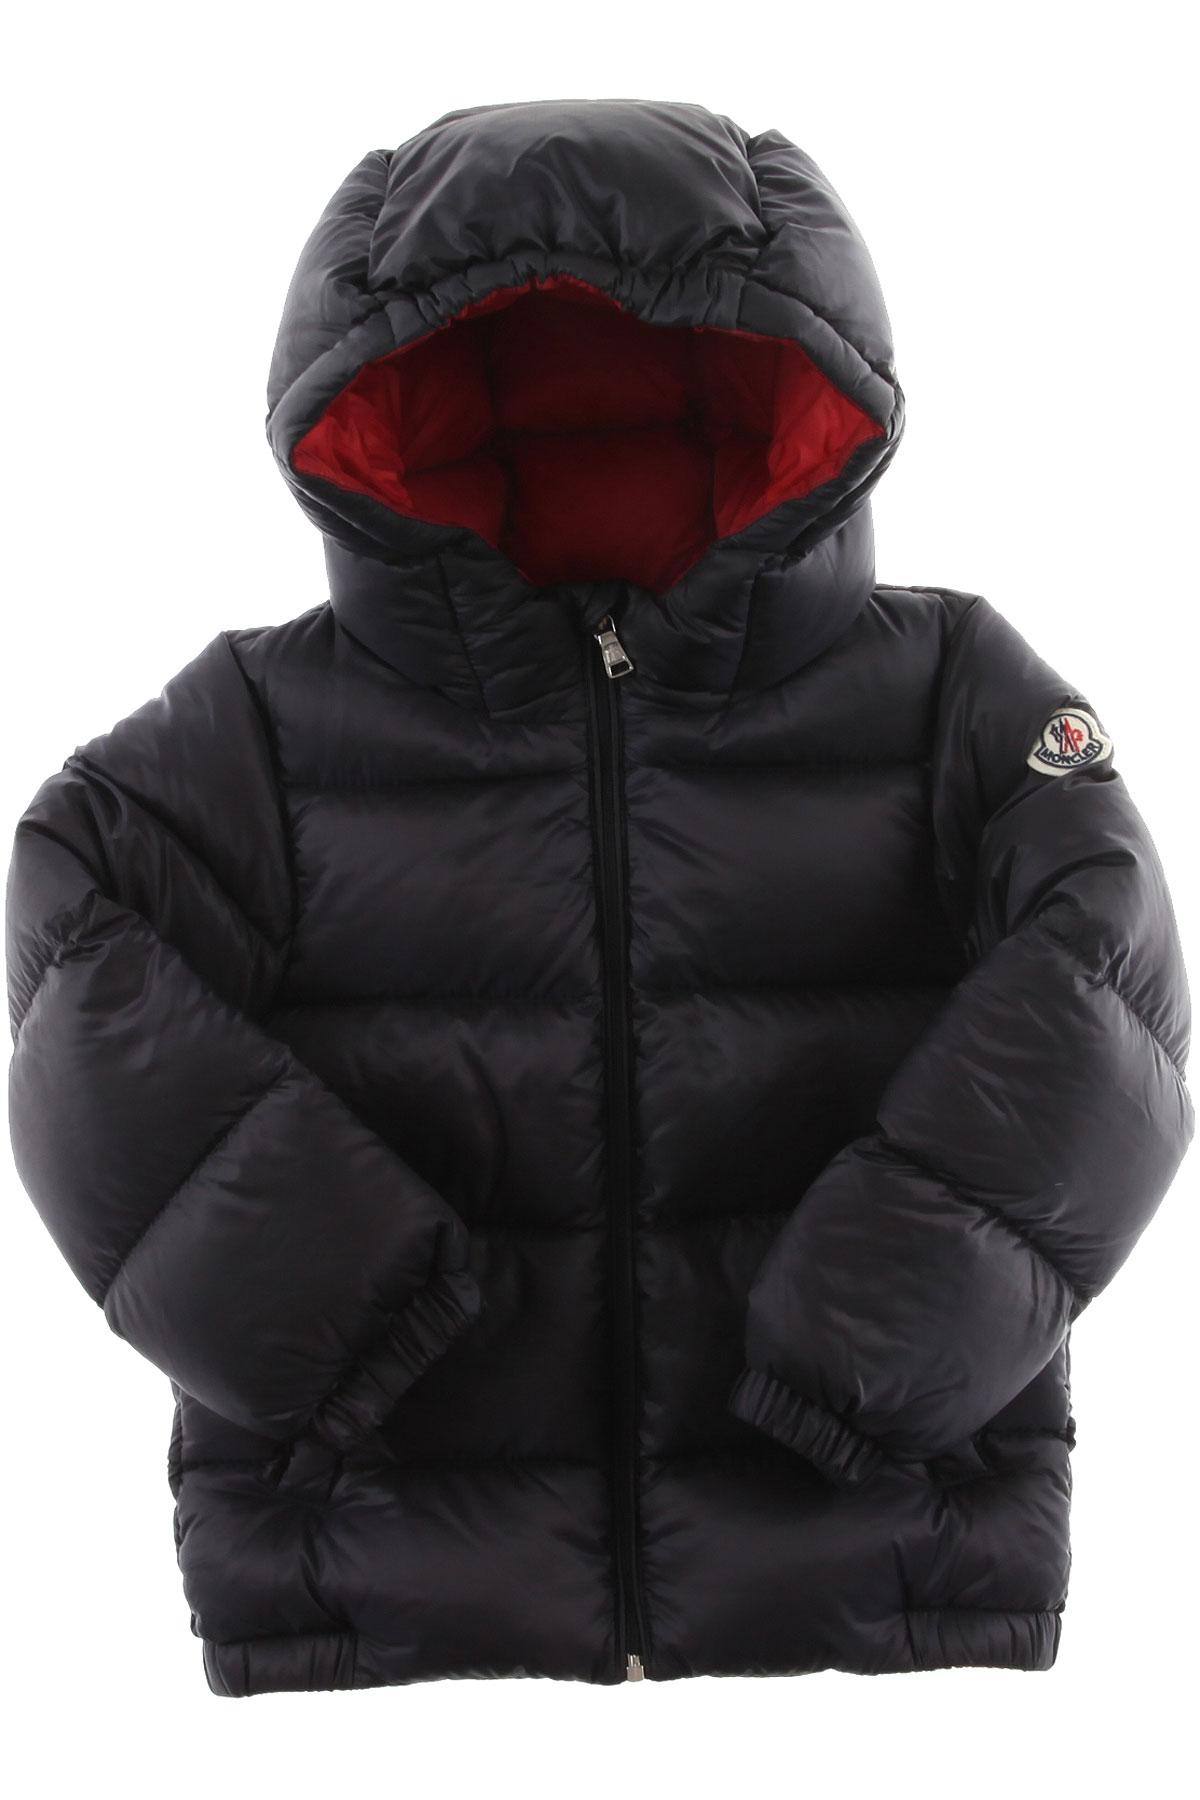 18510a2bc177 Baby Boy Clothing Moncler